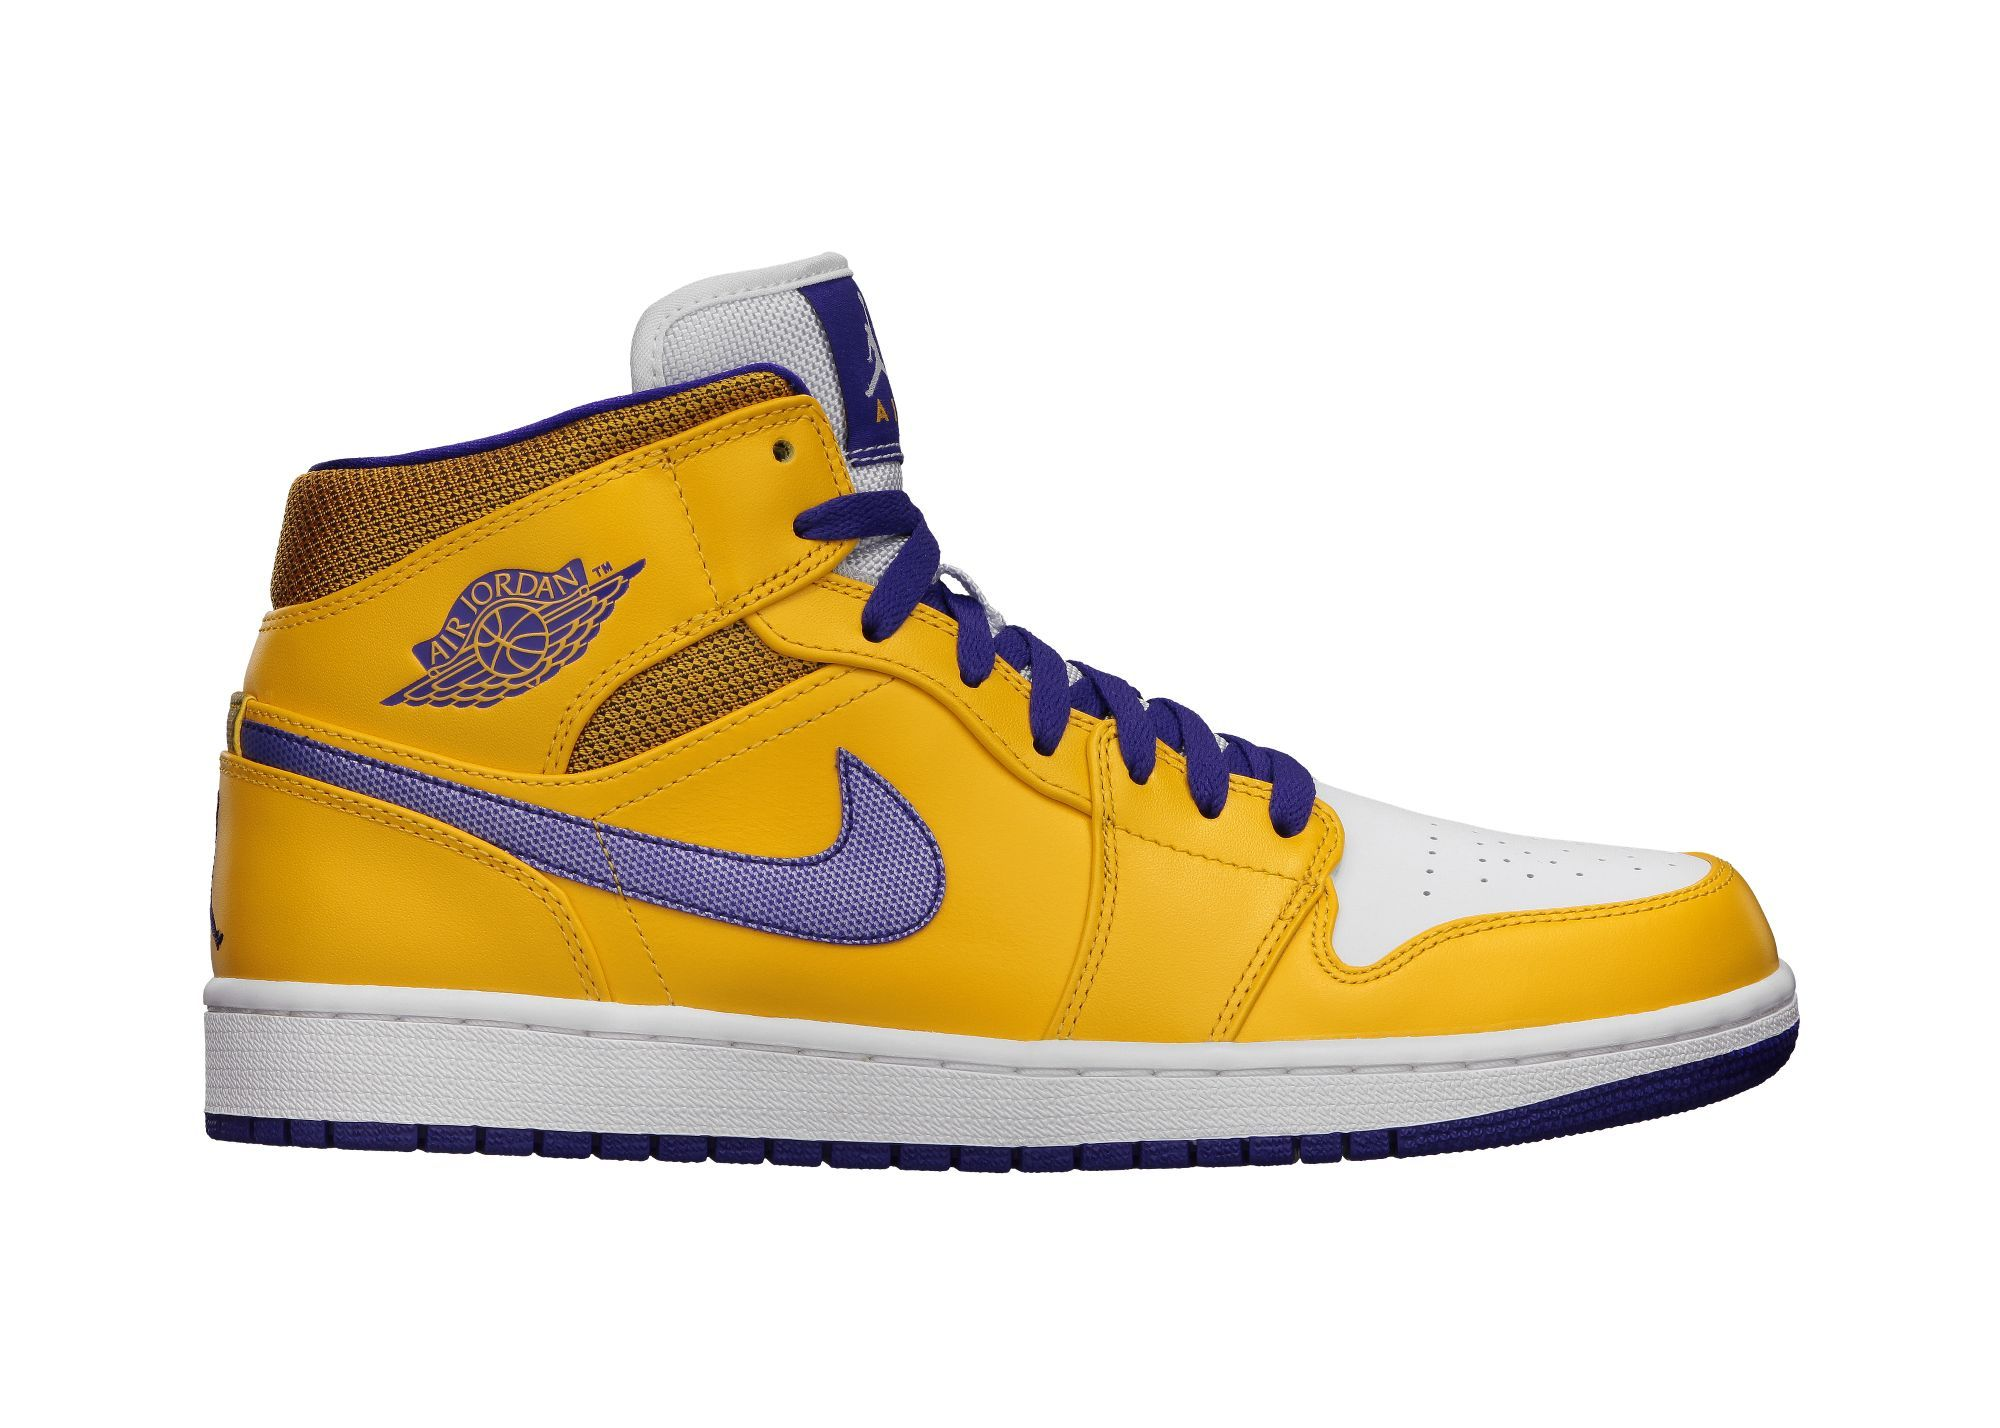 eb8443217bb92c  17 Nike Air Jordan 1 Retro Lakers colorway Bought at Niketown Seattle -  5 19 2013  105